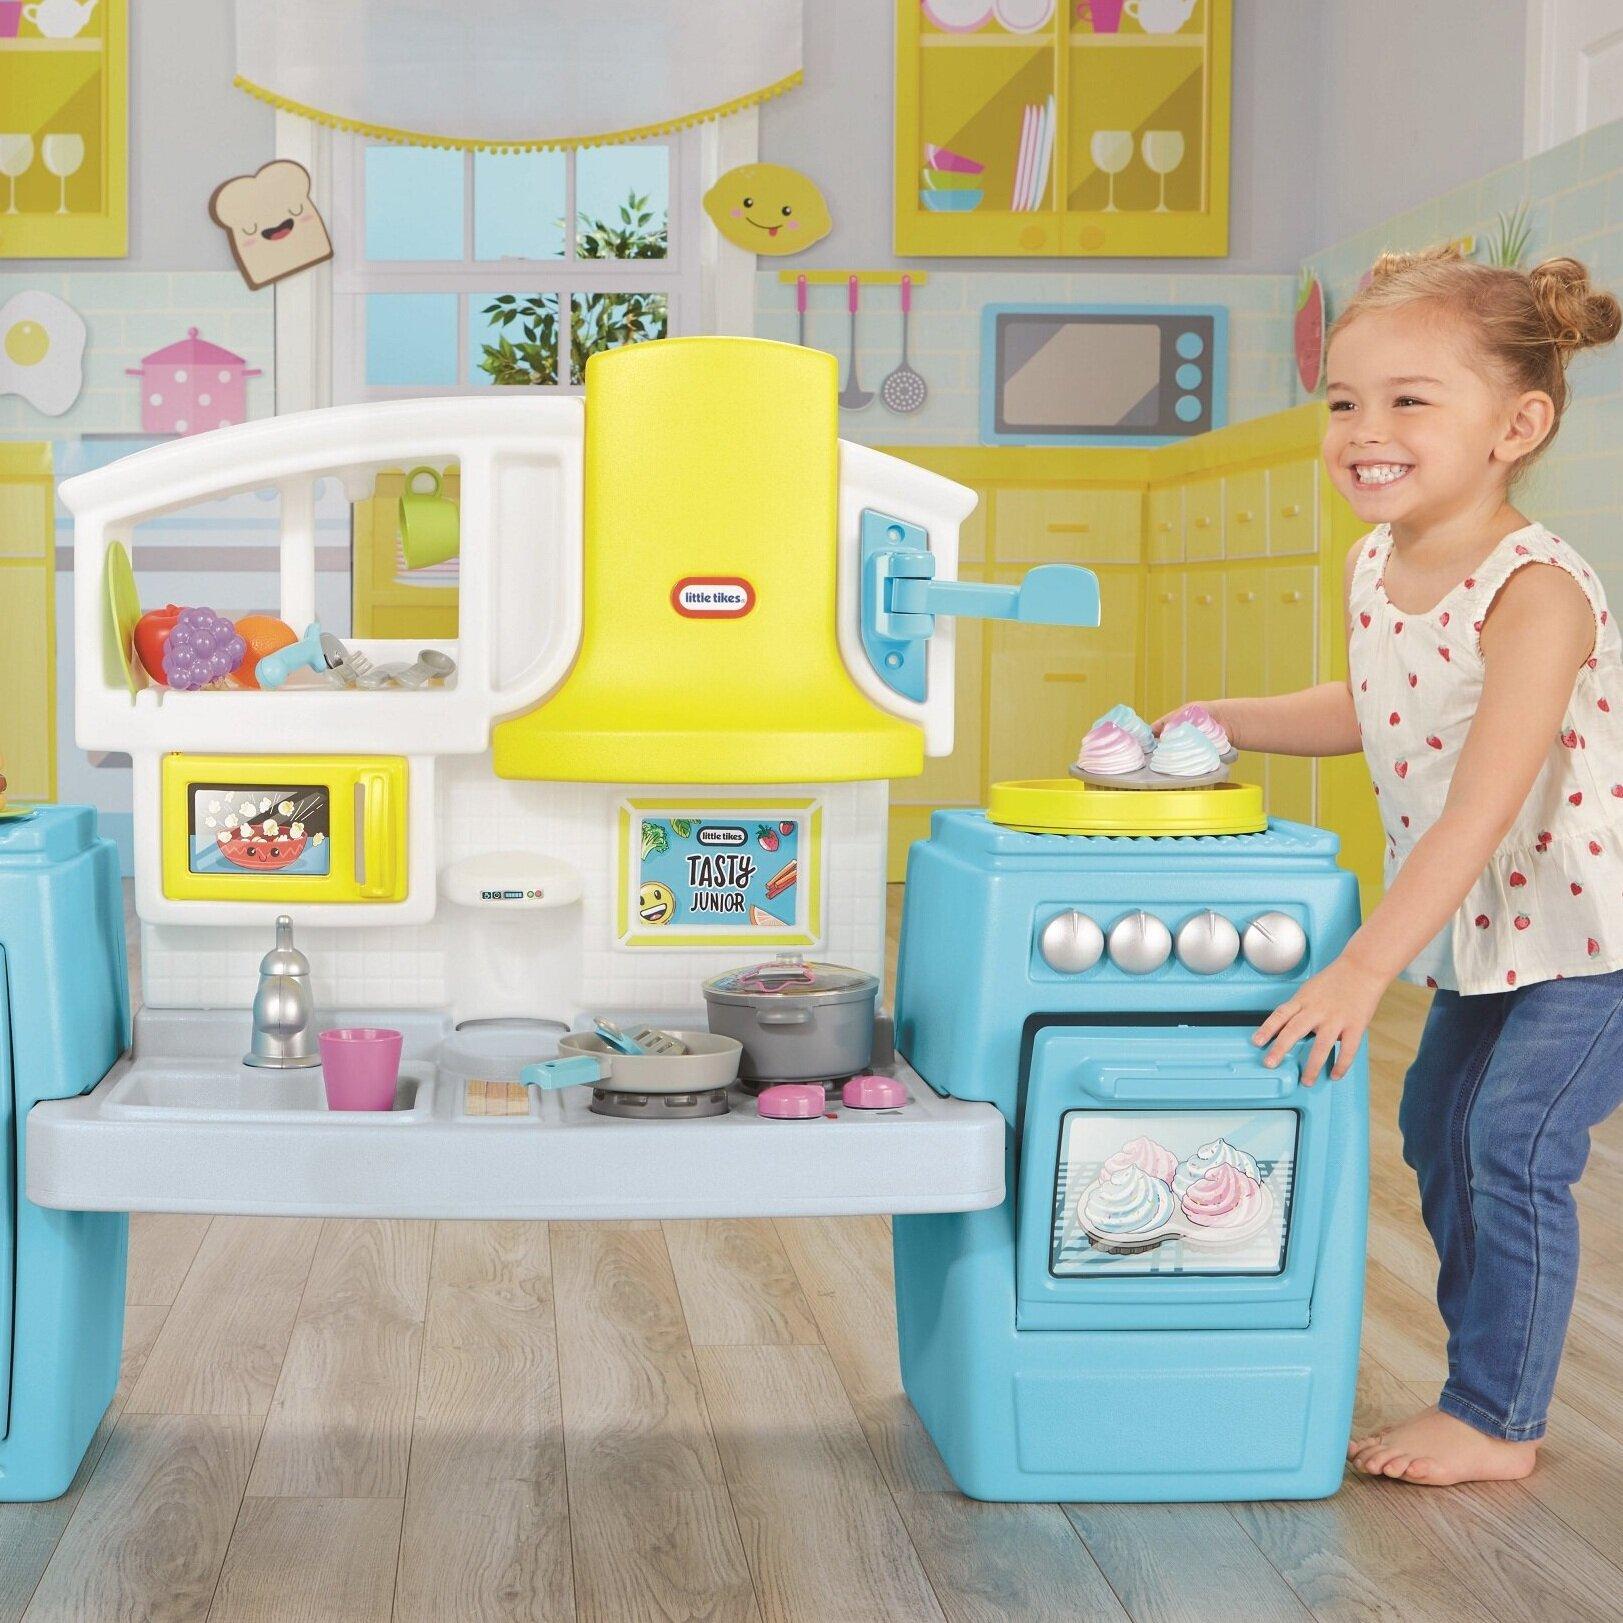 Bake 'n Share play Kitchen - $79.98